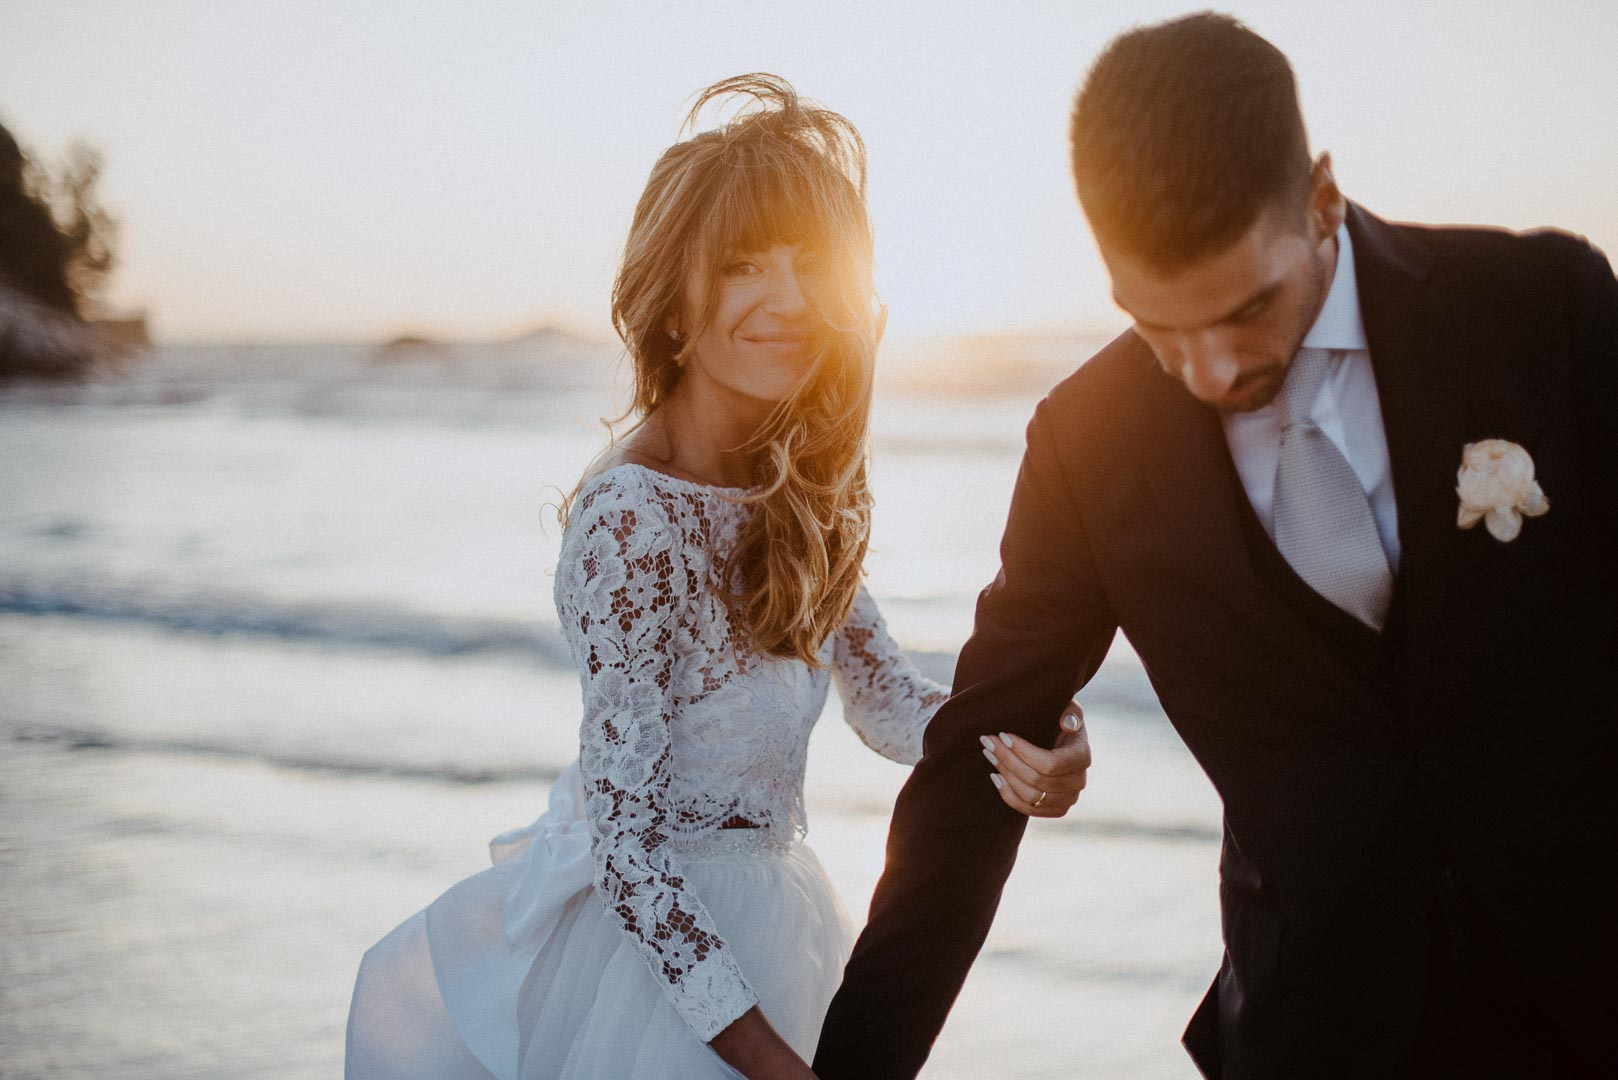 wedding-photographer-destination-fineart-bespoke-reportage-napoli-nabilah-vivianeizzo-spazio46-125